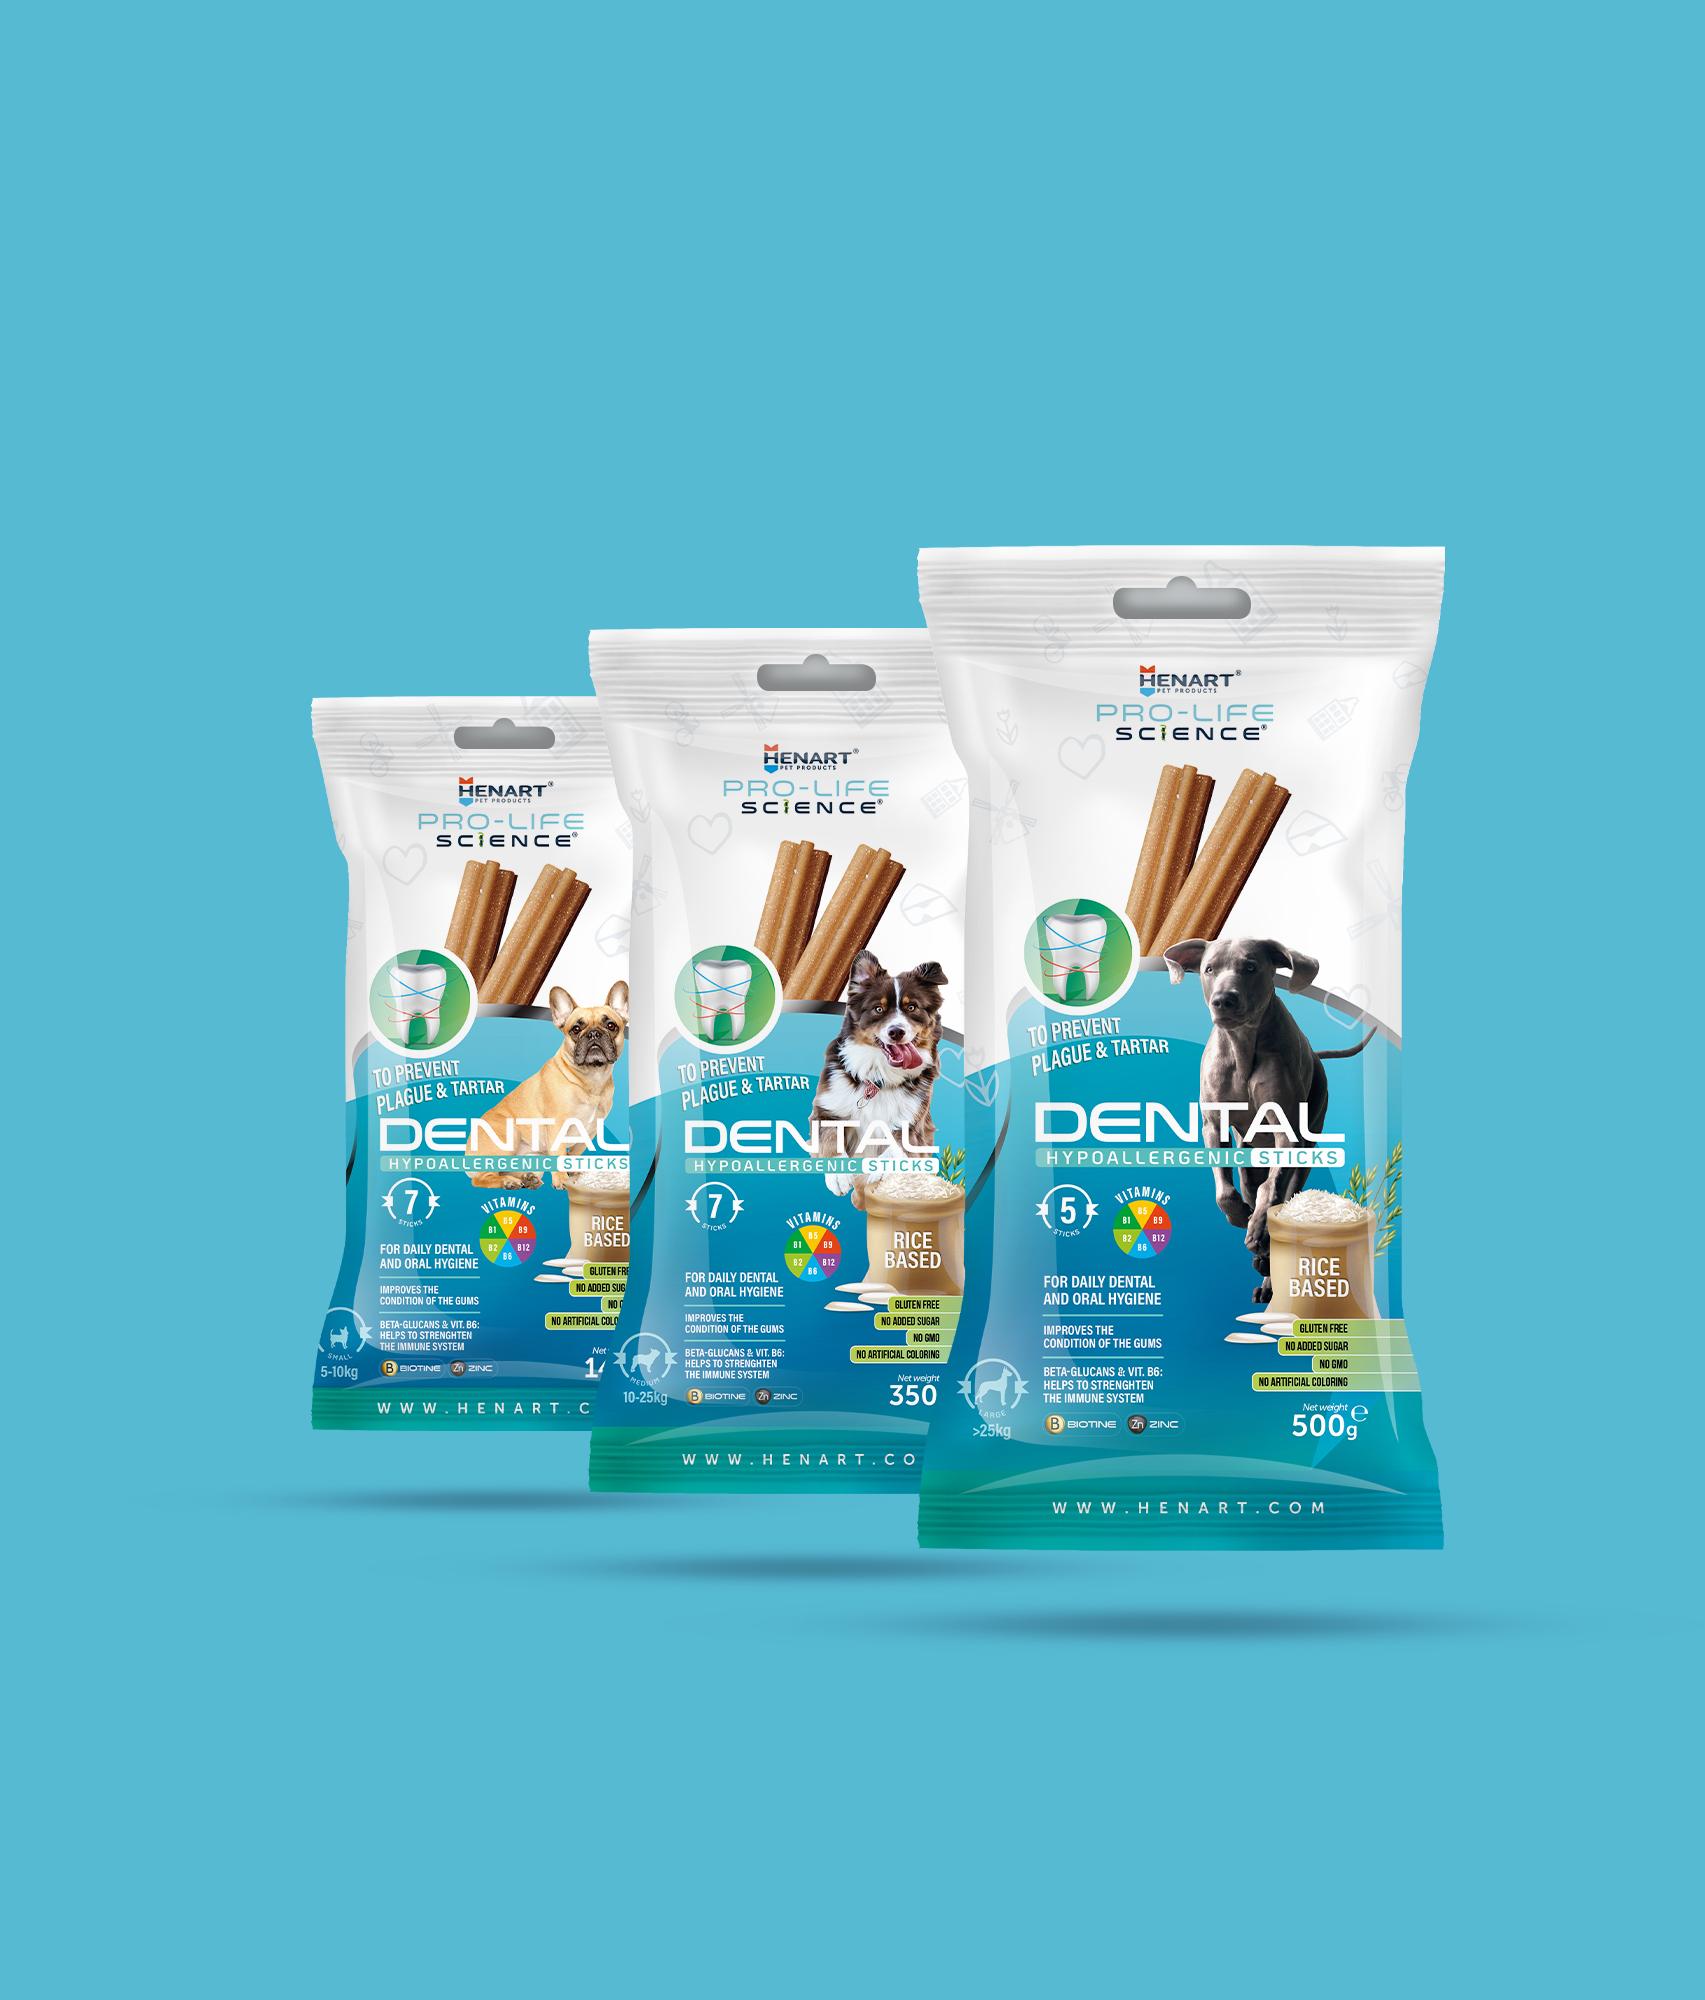 HenArt Dental Sticks